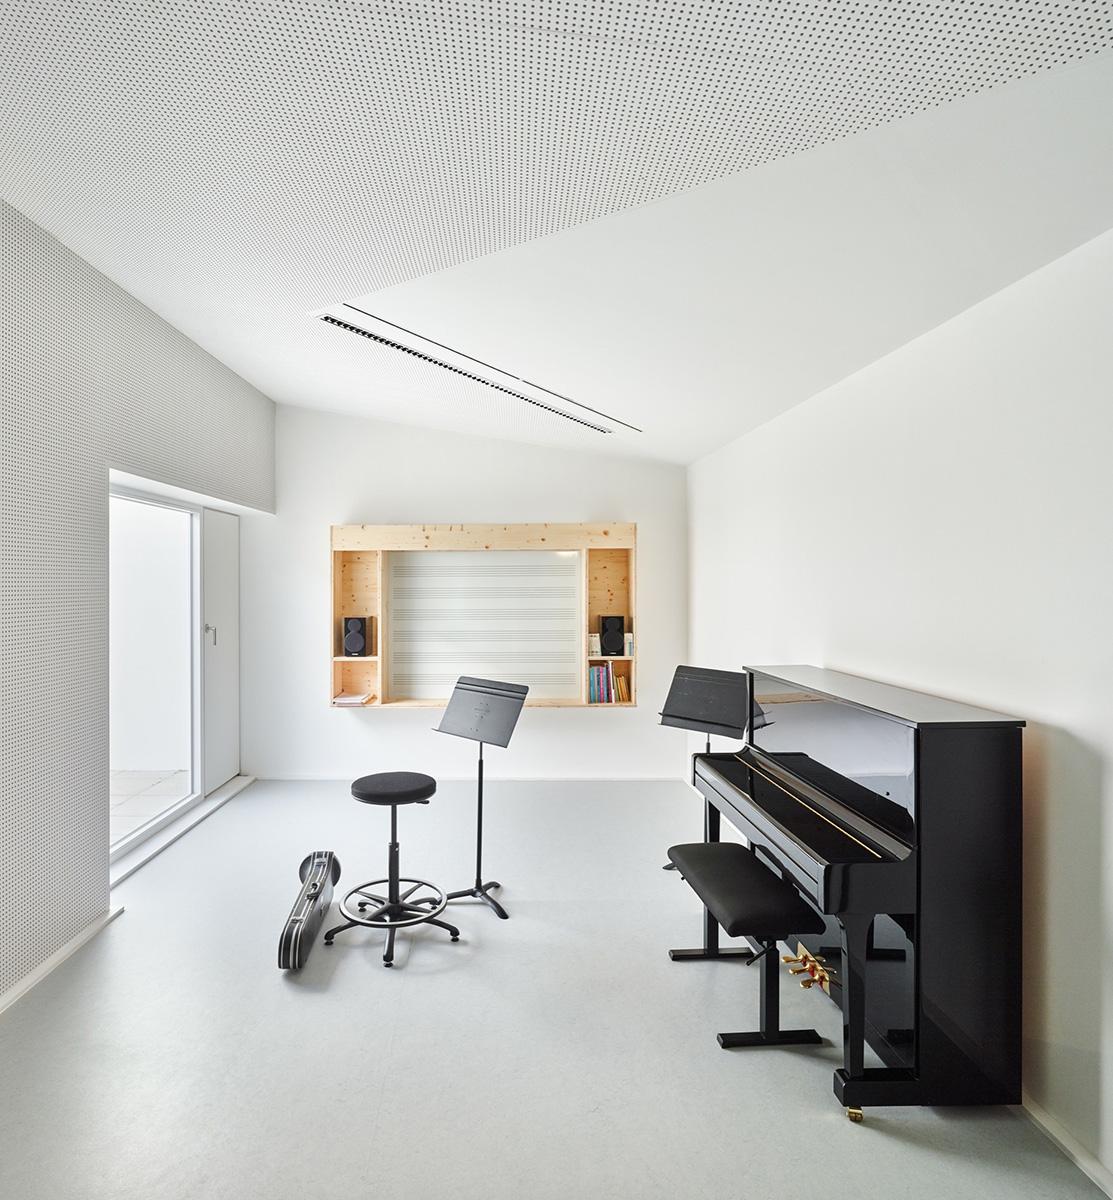 10-conservatorio-musica-danza-artes-dramaticas-henri-dutilleux-dominique-coulon-architecte